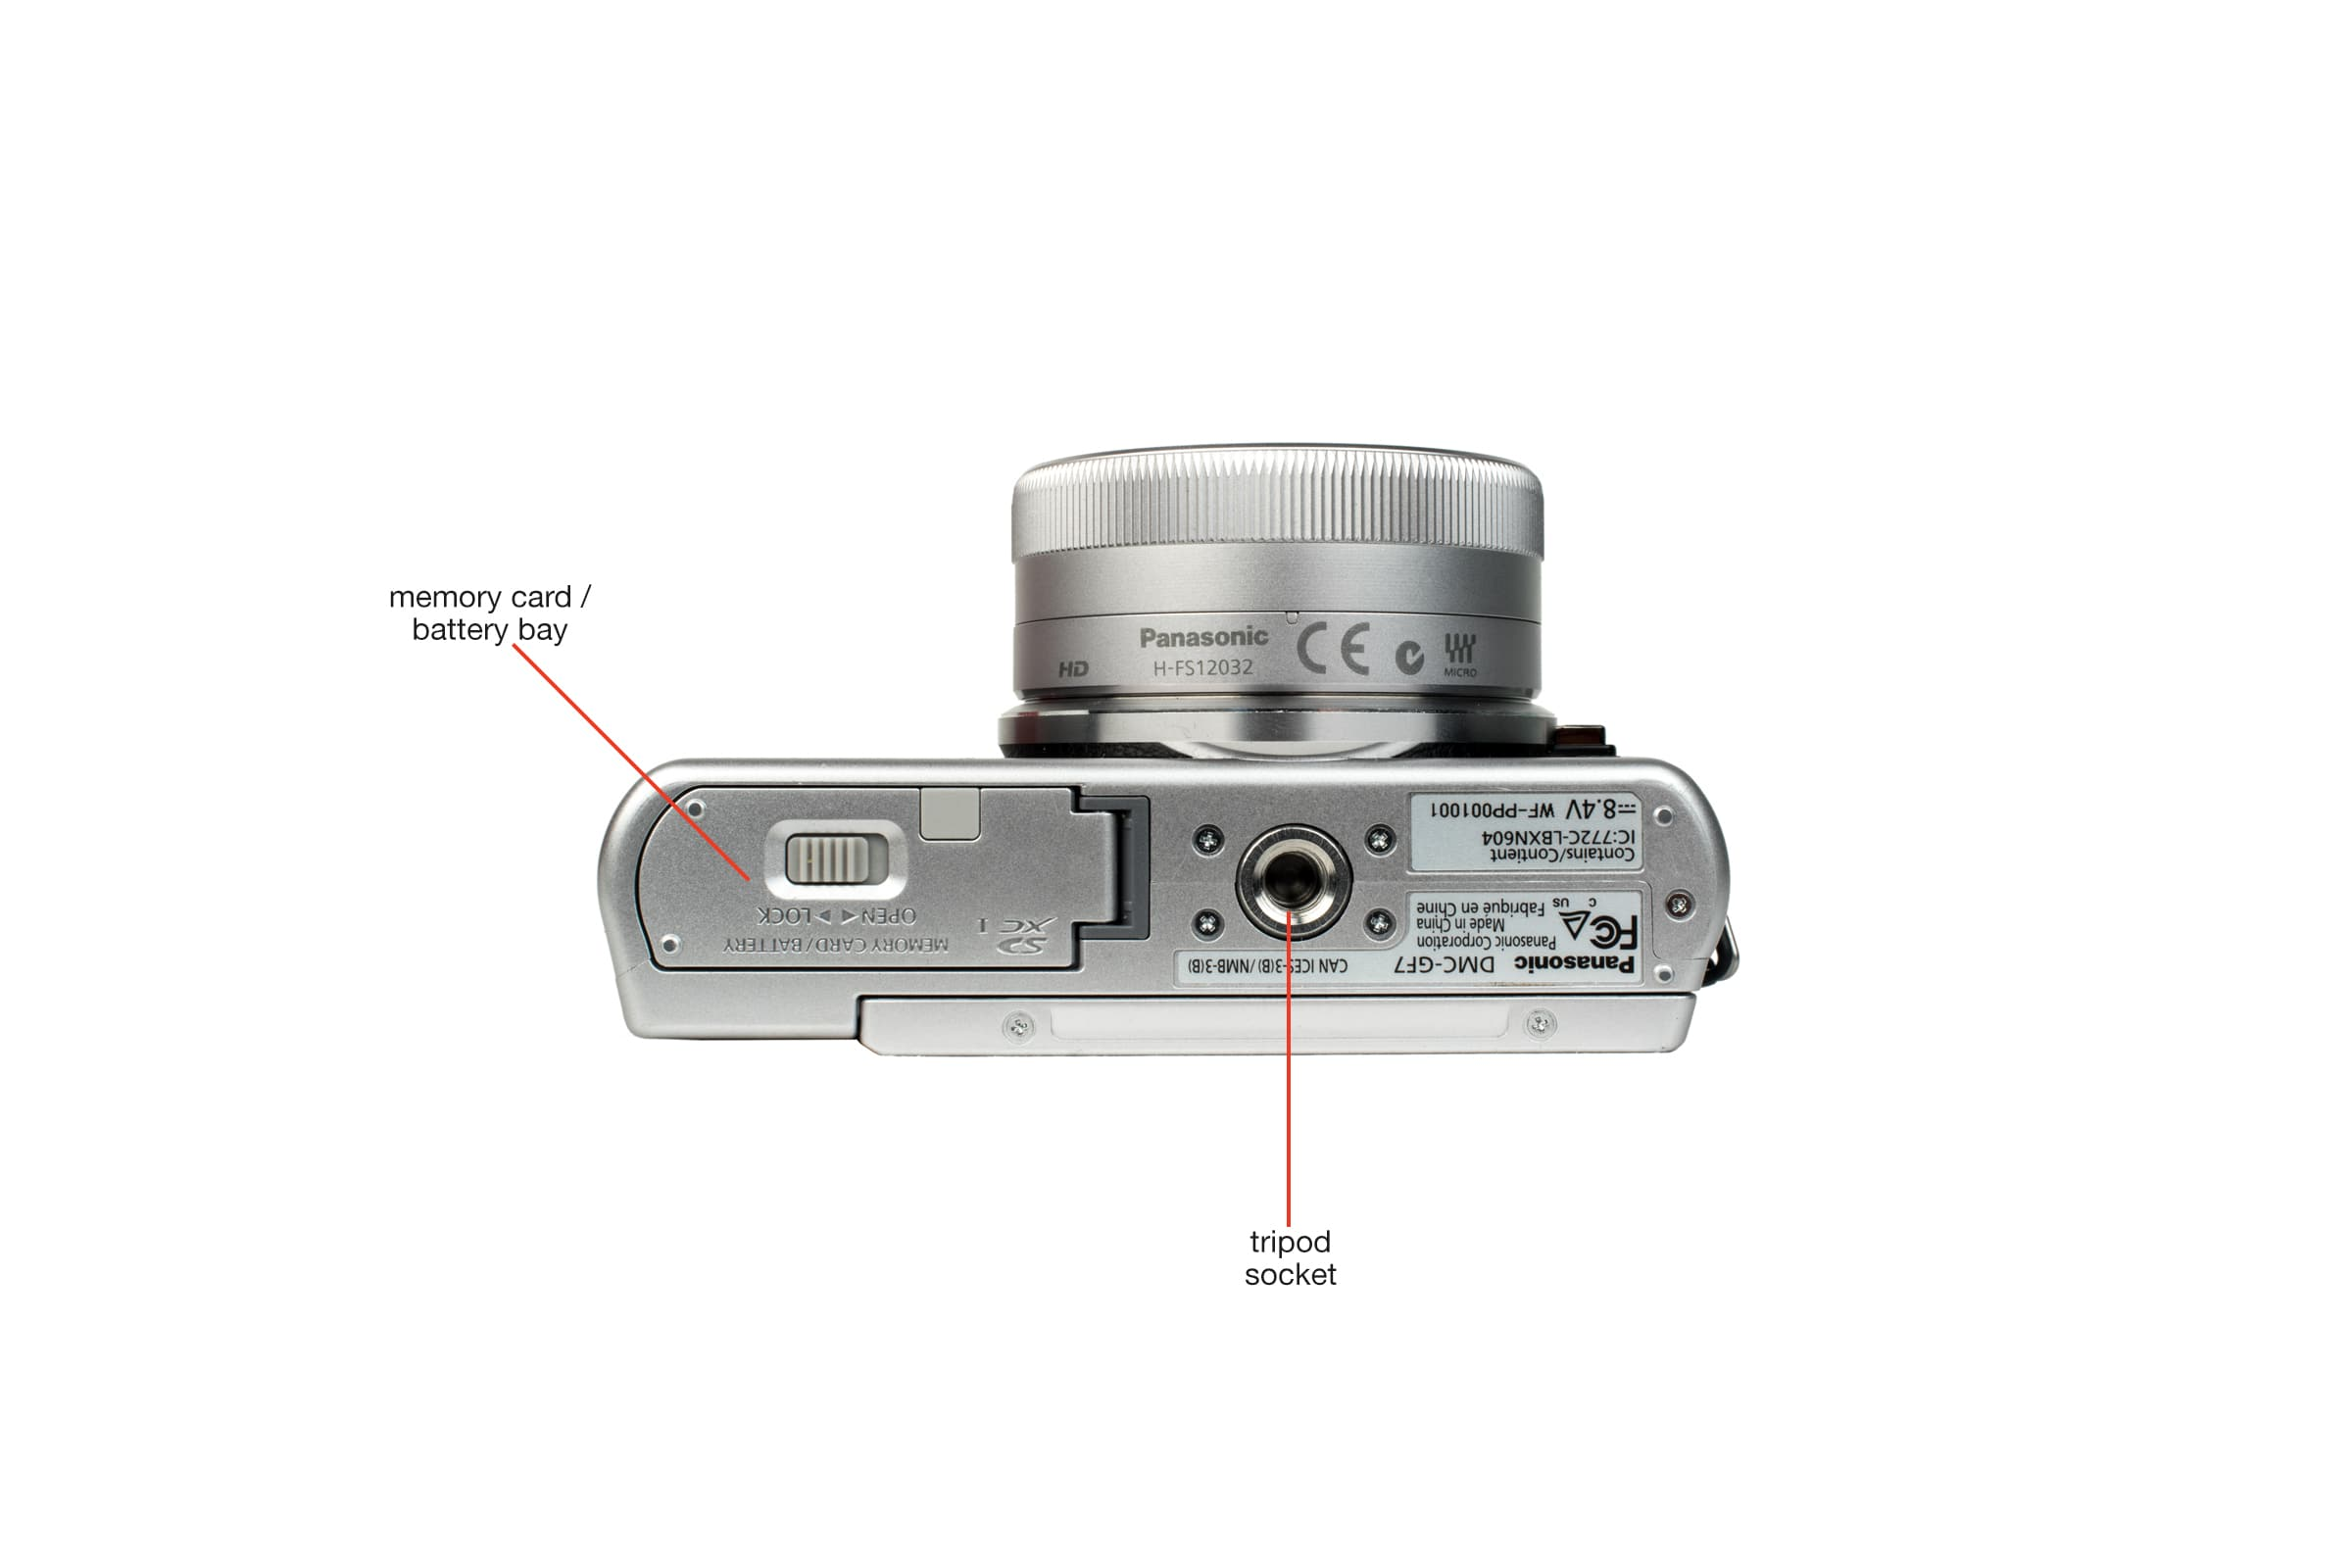 Bottom view of the Panasonic Lumix DMC GF7 .